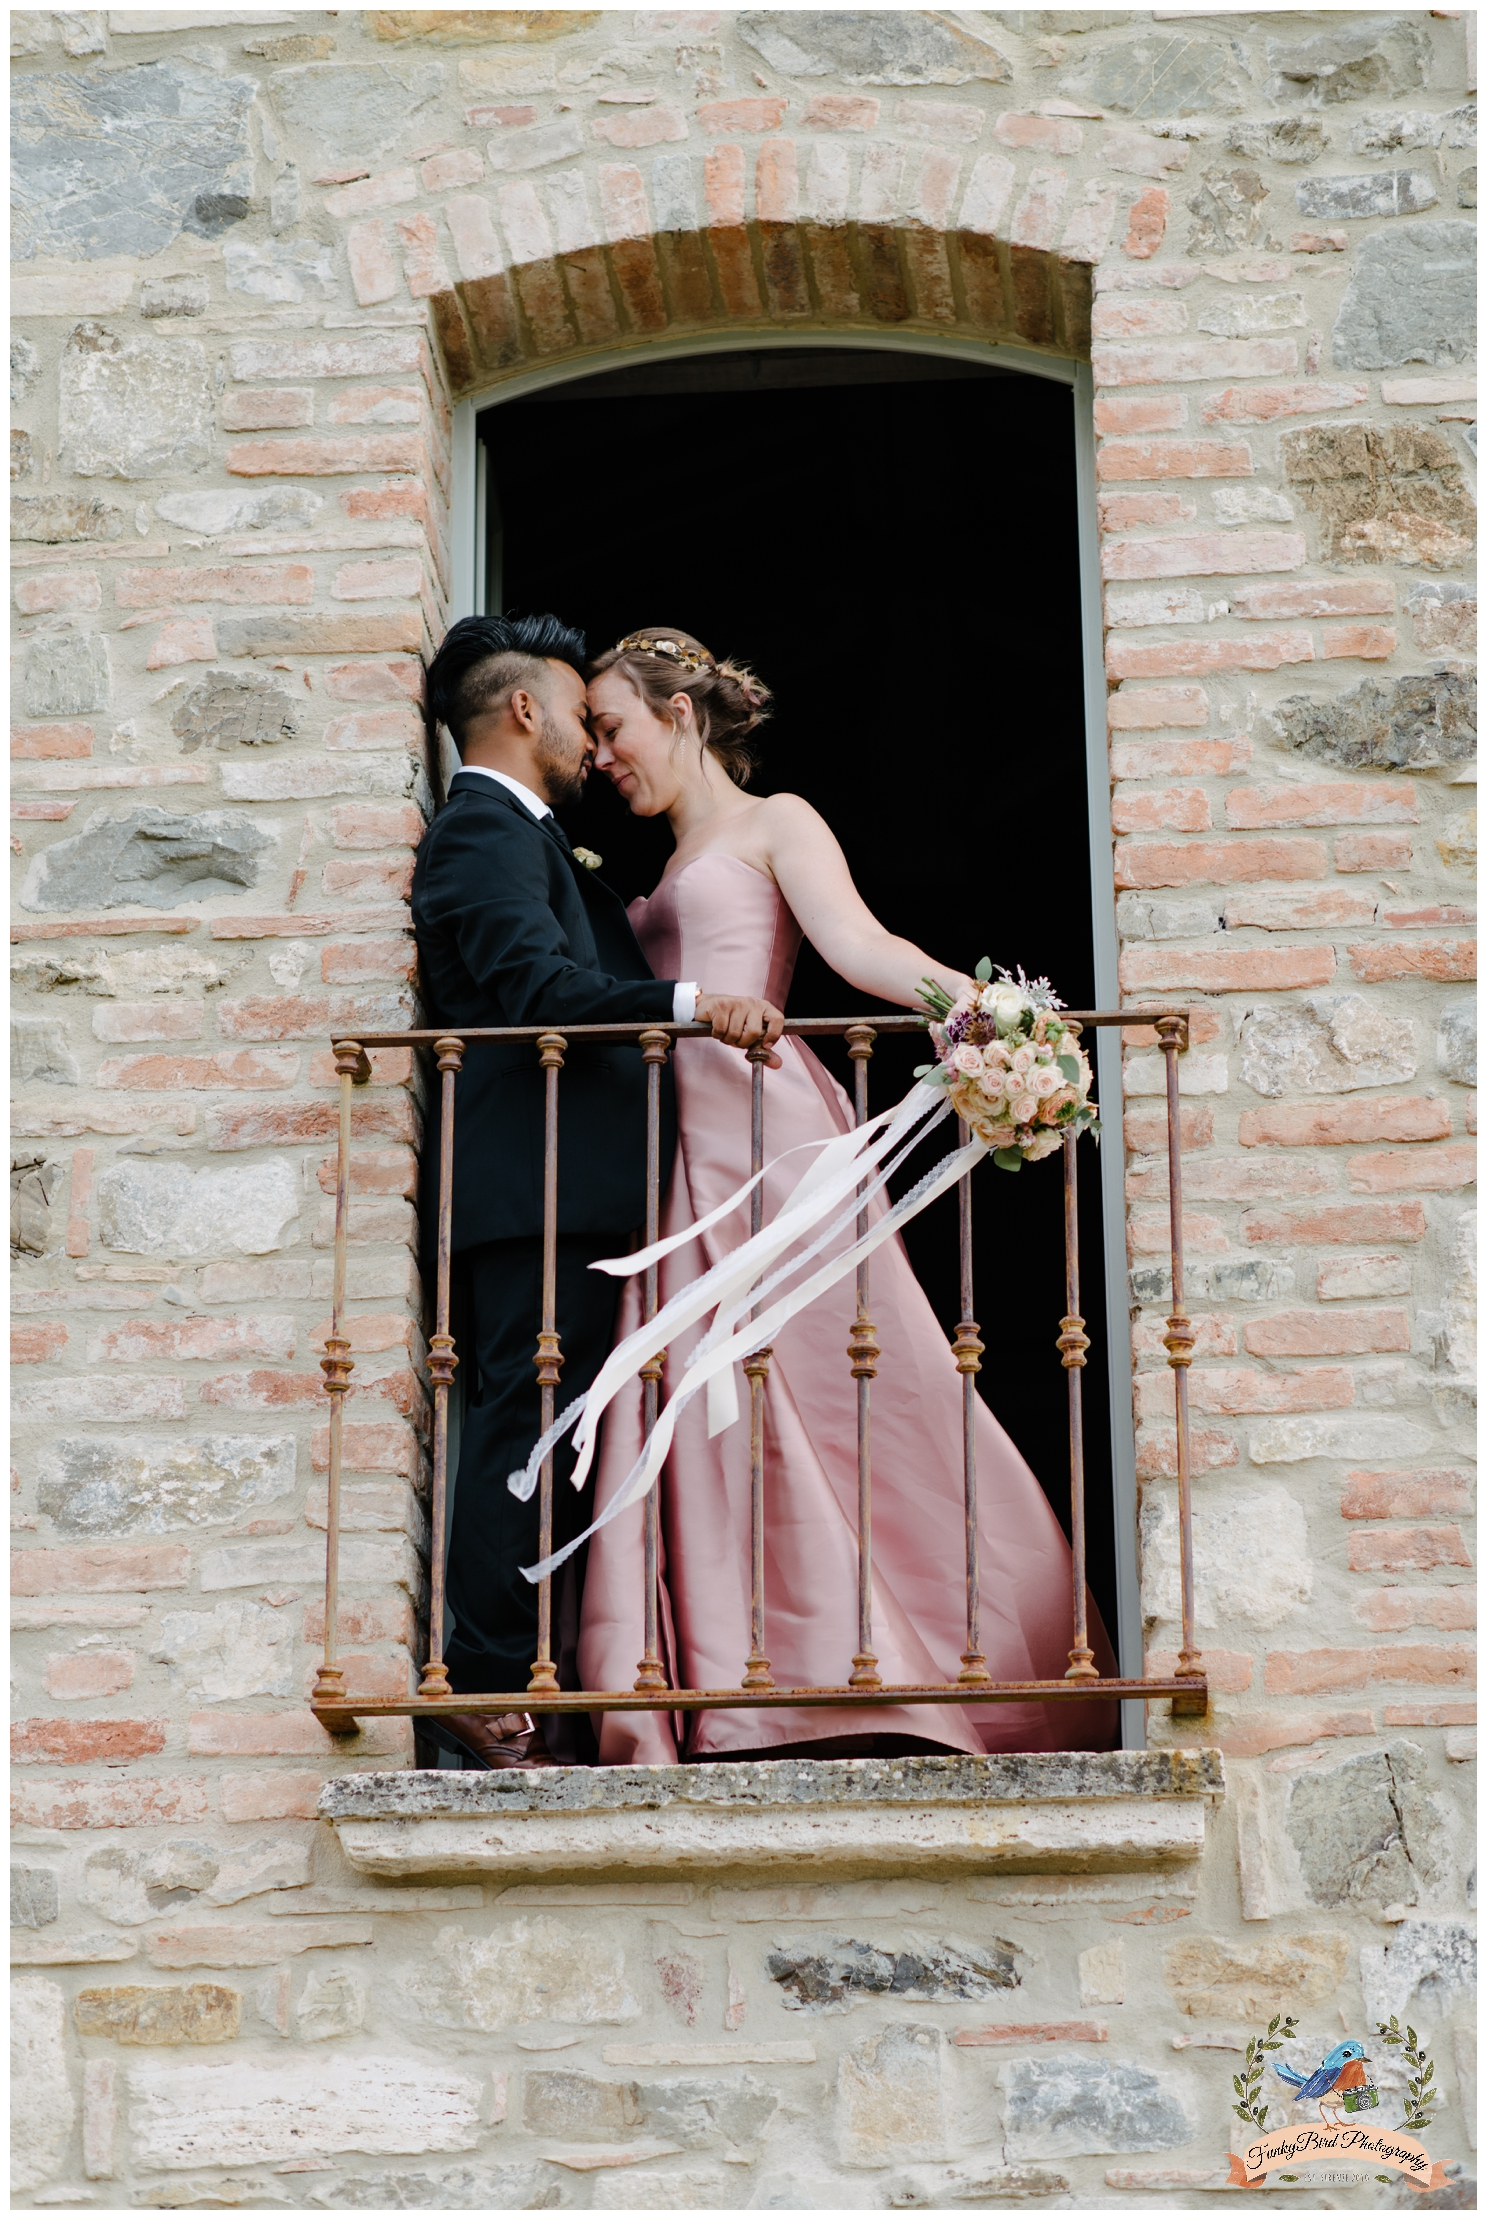 Tuscany_Wedding_Photographer_Bruidsfotograaf_Amsterdam_0028.jpg